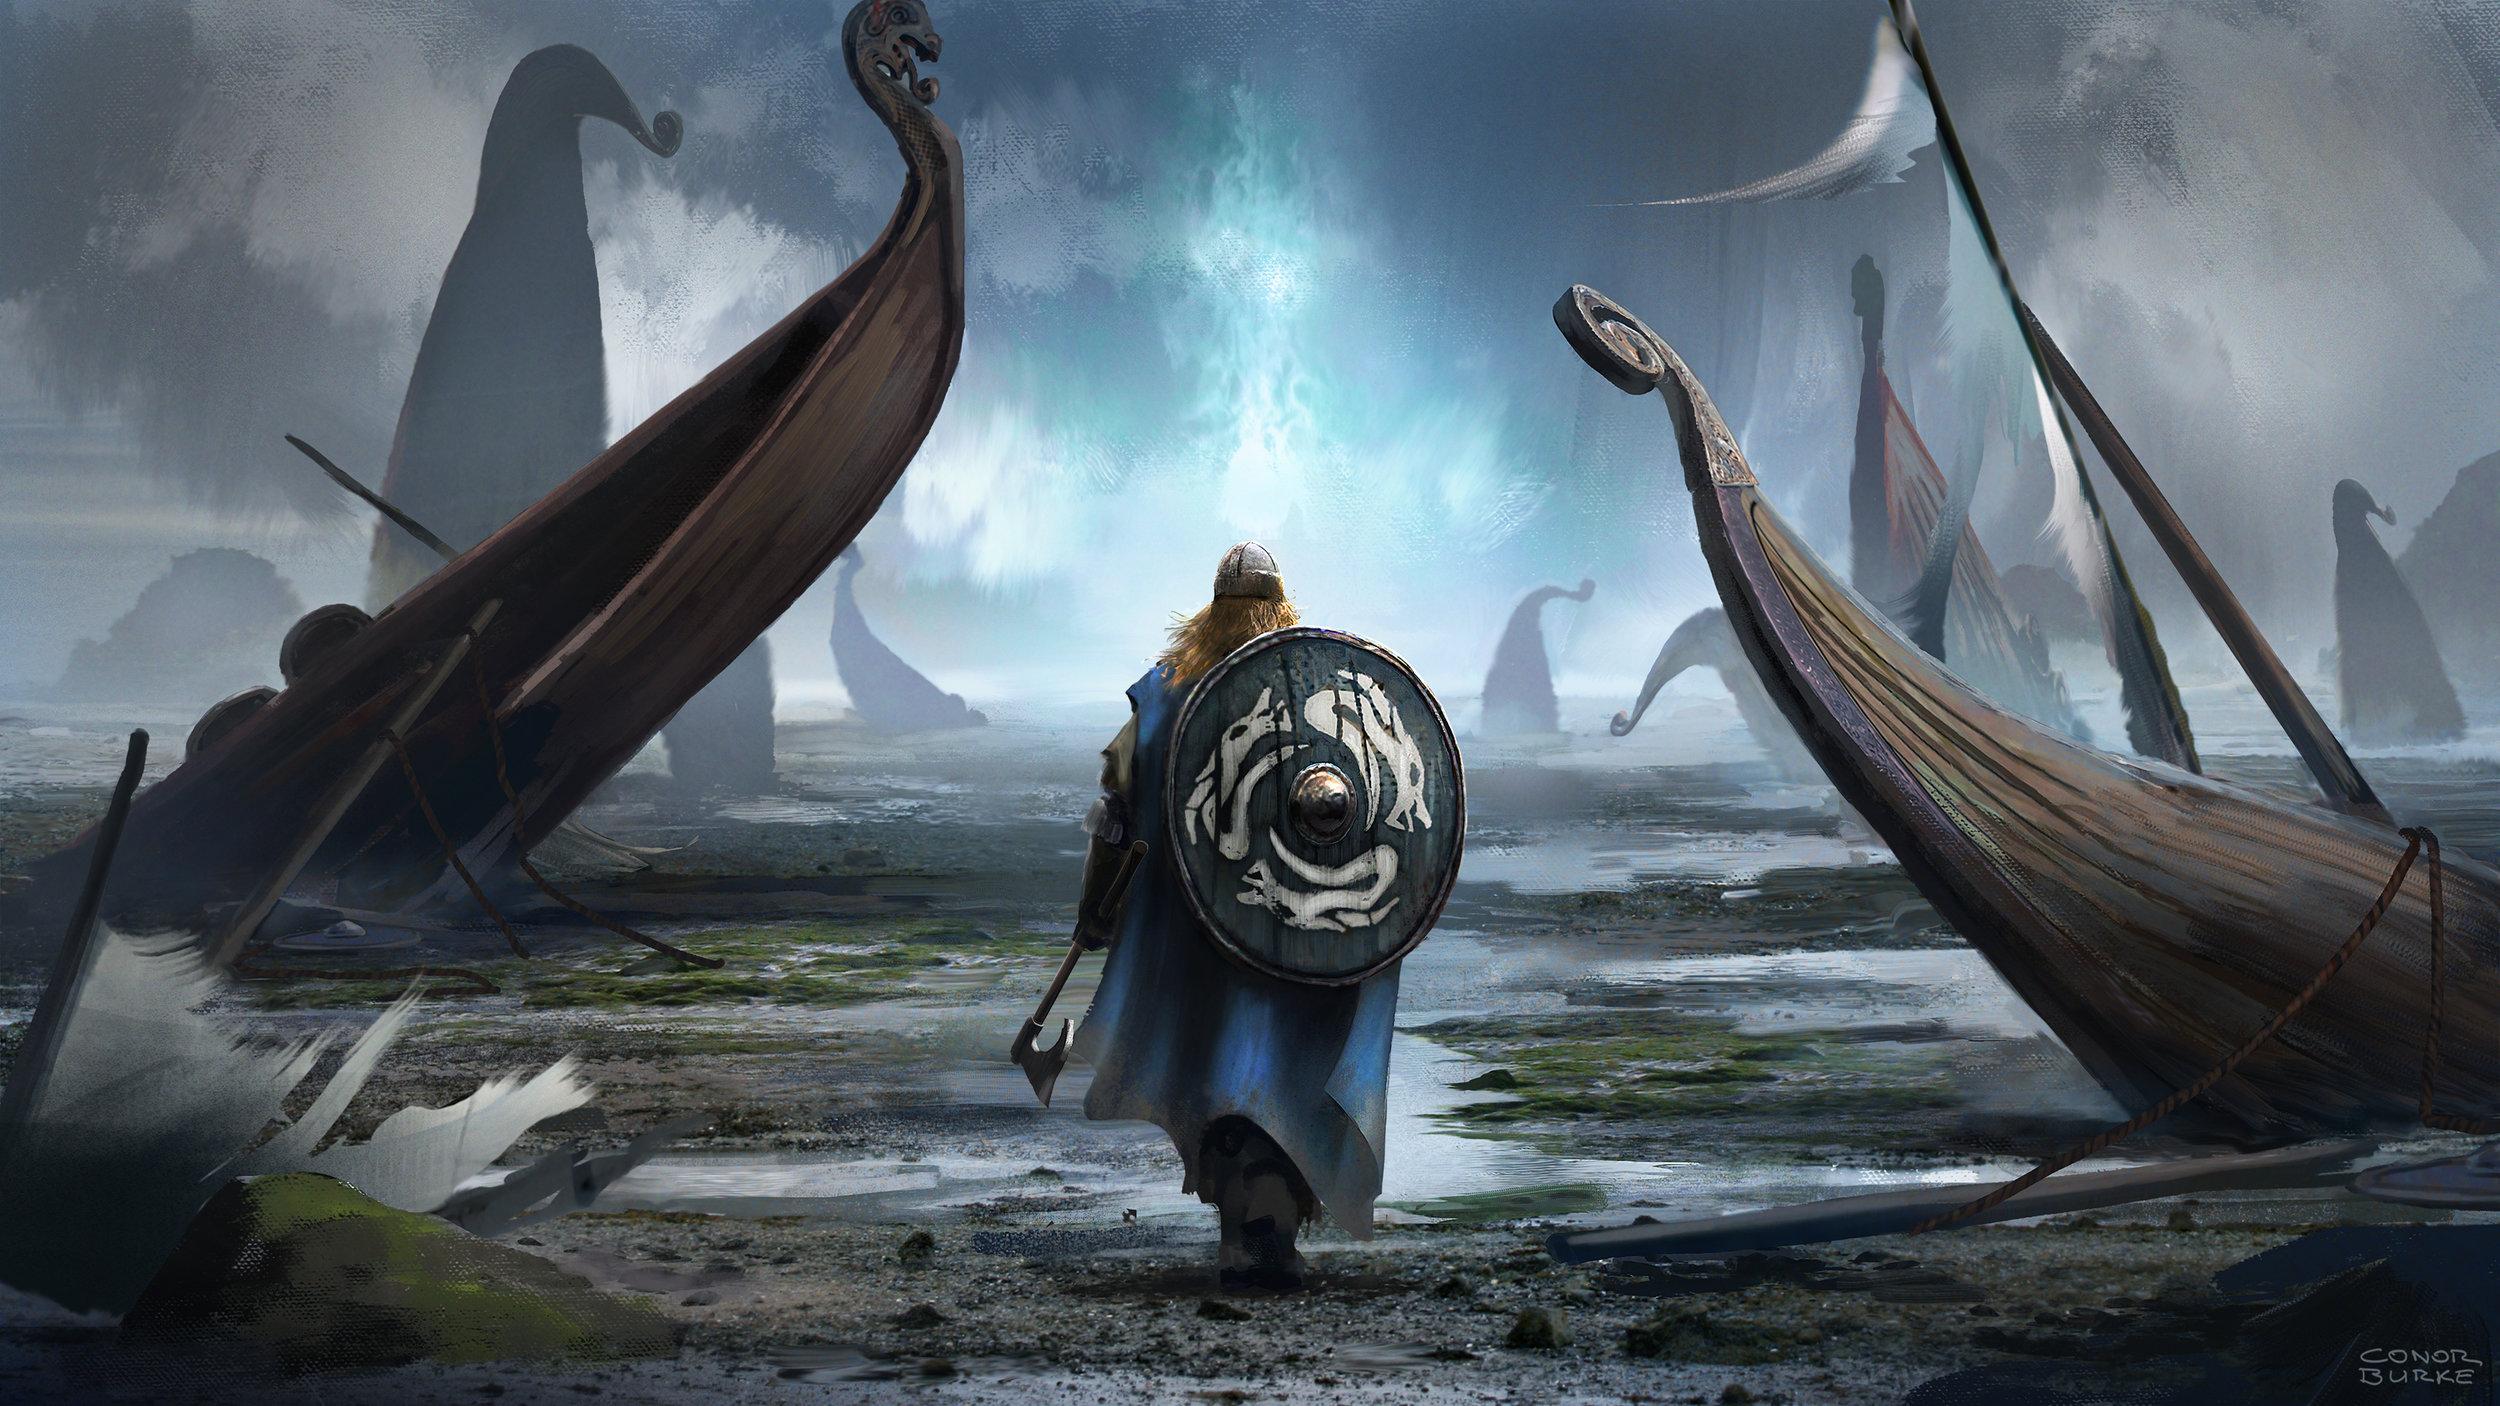 1161-viking-cataclysm-conor-burke